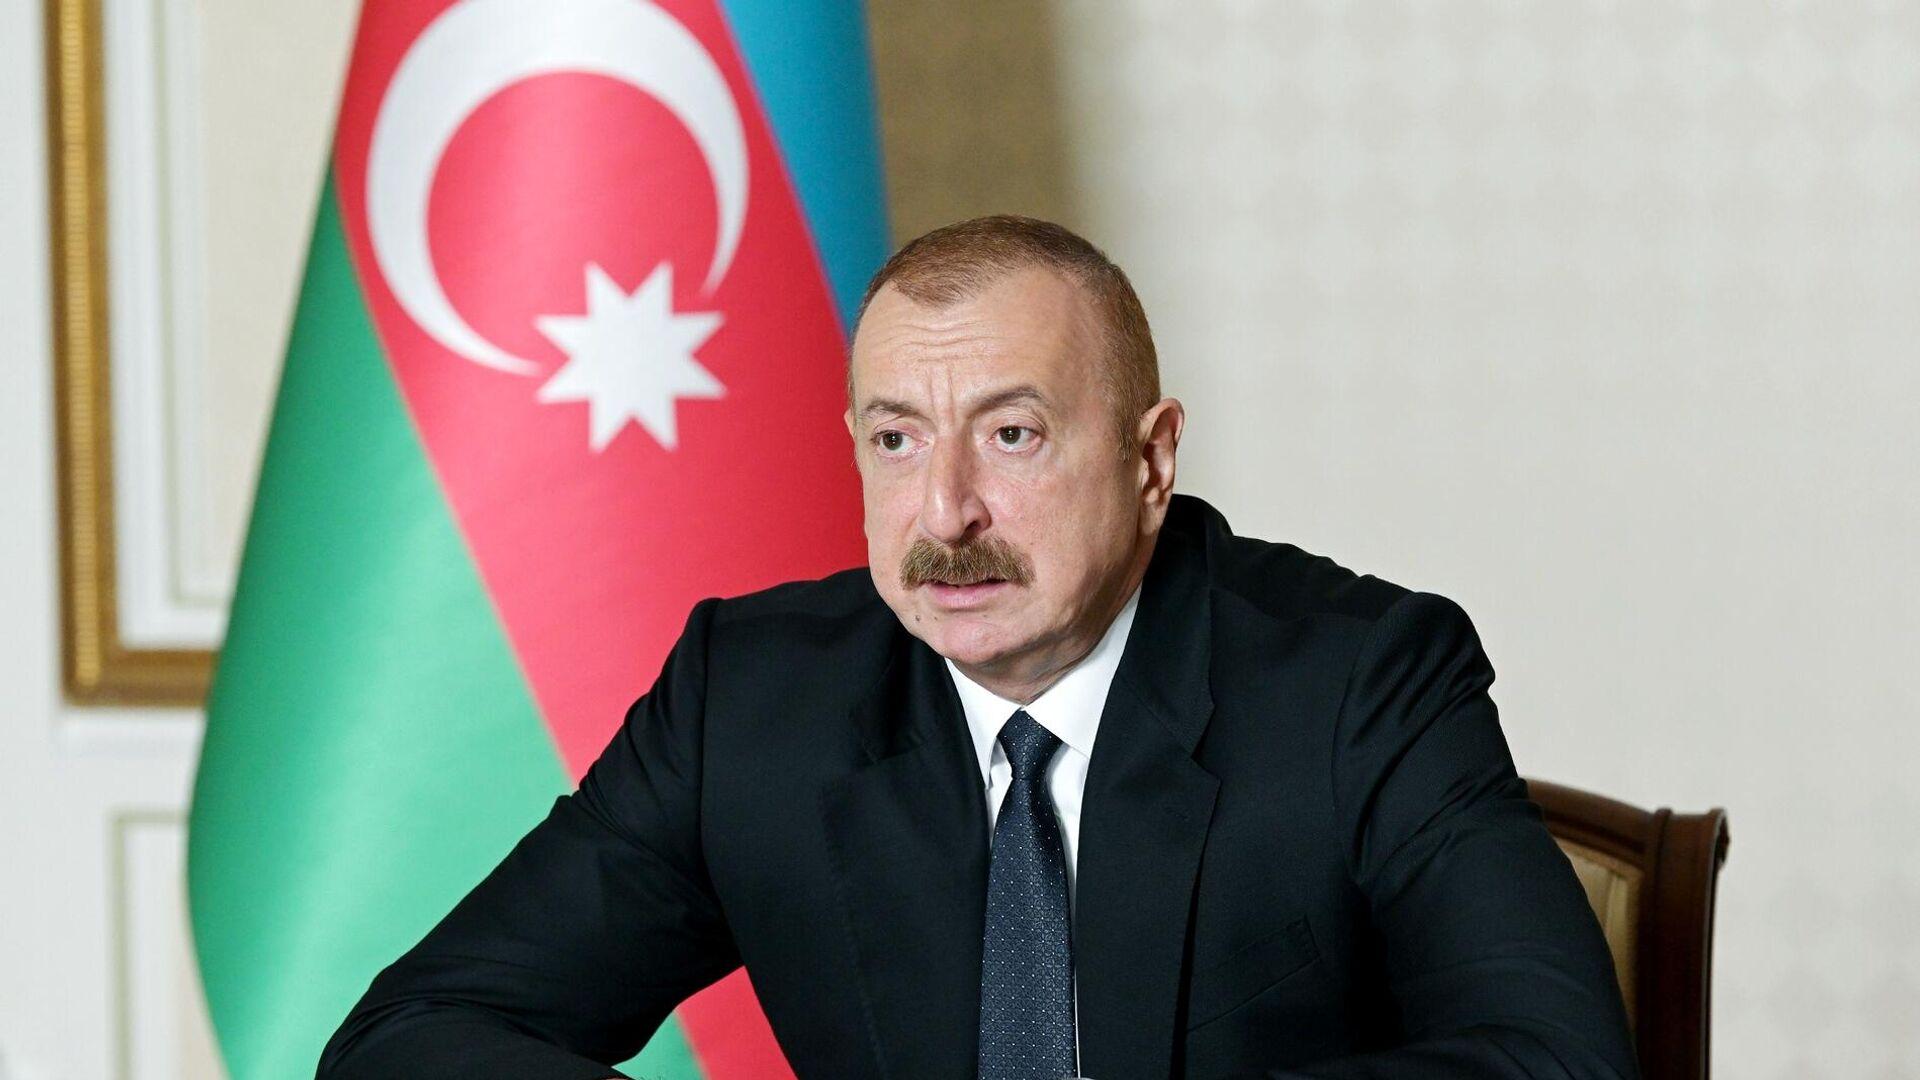 Президент Азербайджана Ильхам Алиев - РИА Новости, 1920, 01.11.2020